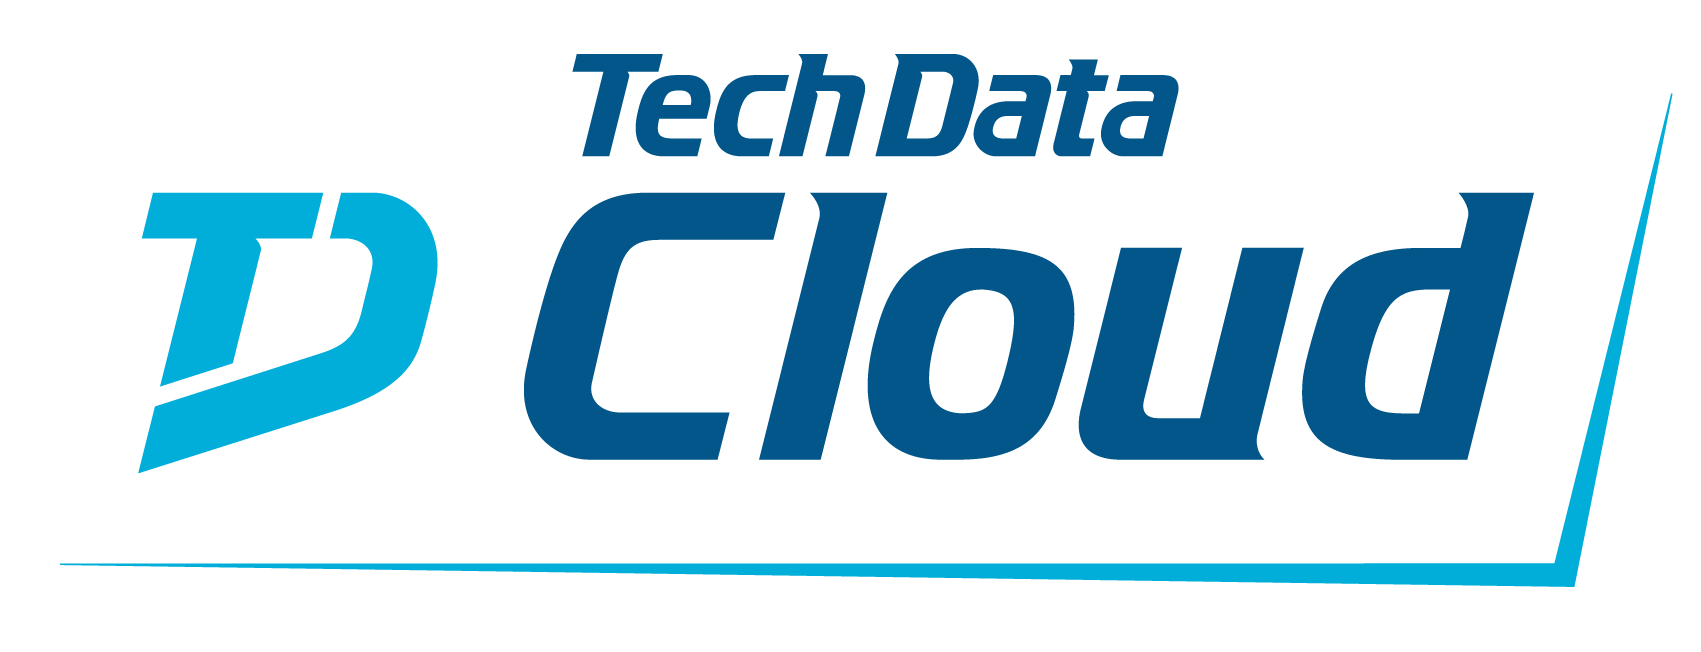 Tech-Data-Cloud_PMS copy.png